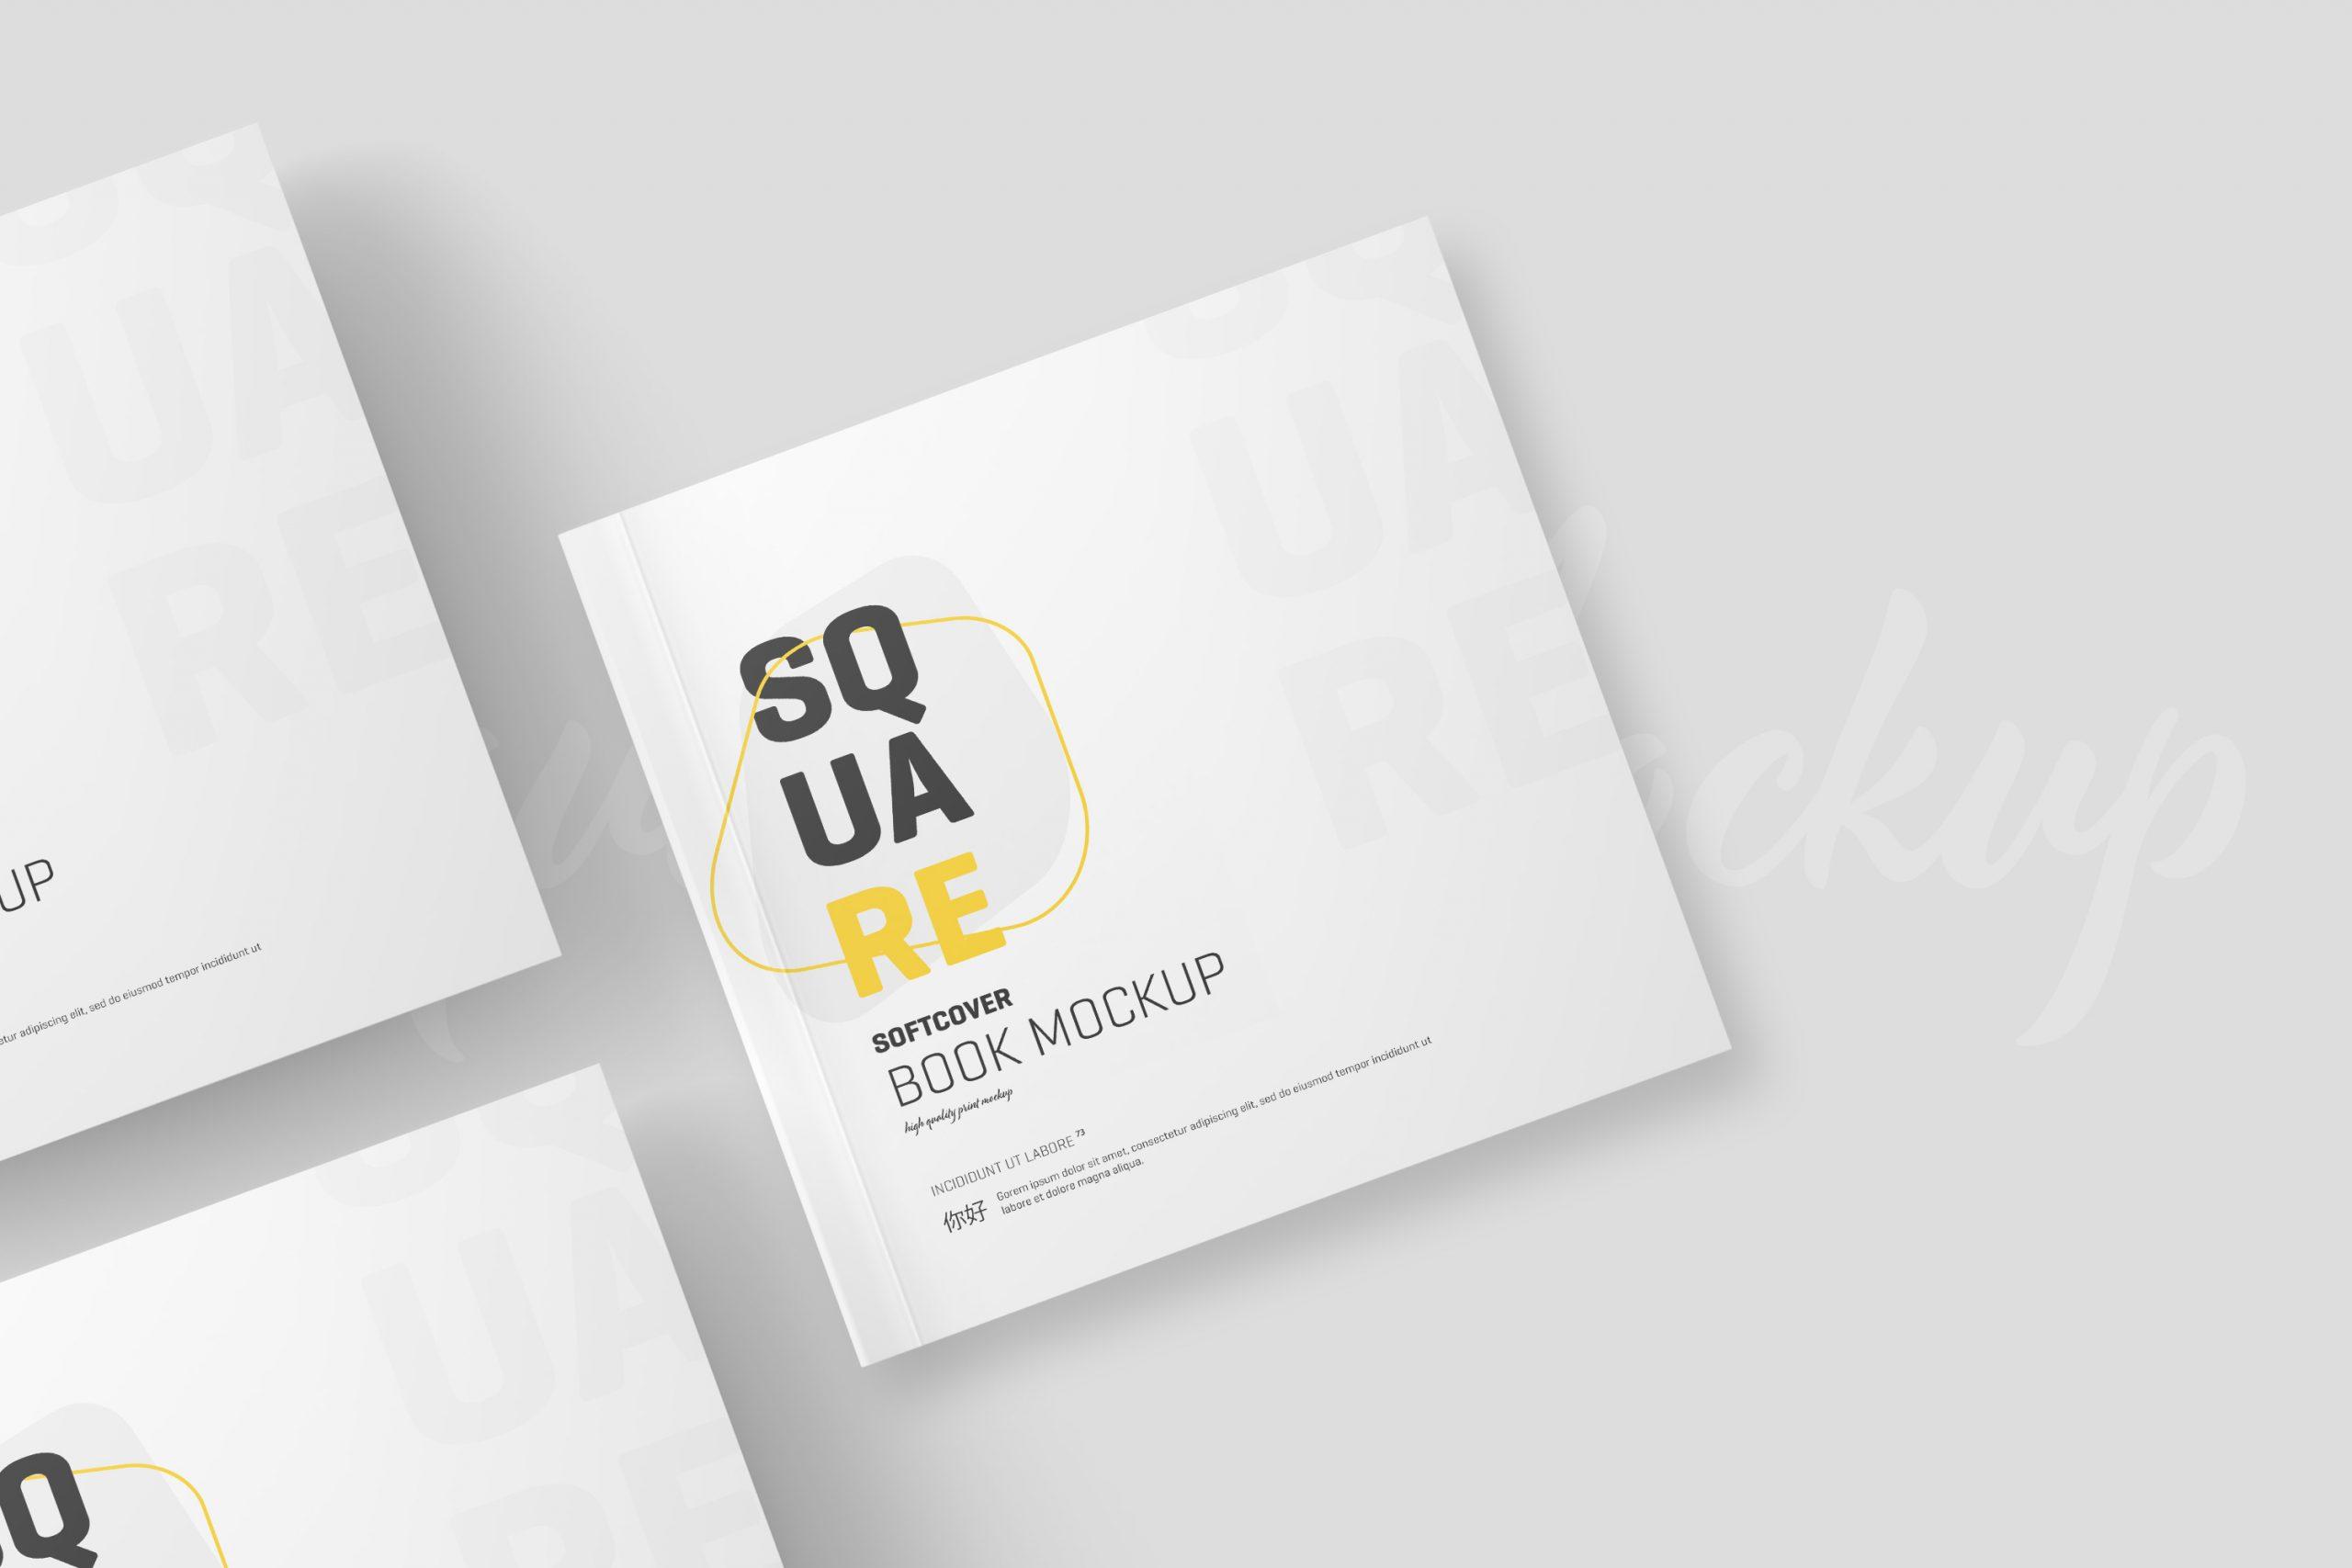 Square Softcover Book Mockup